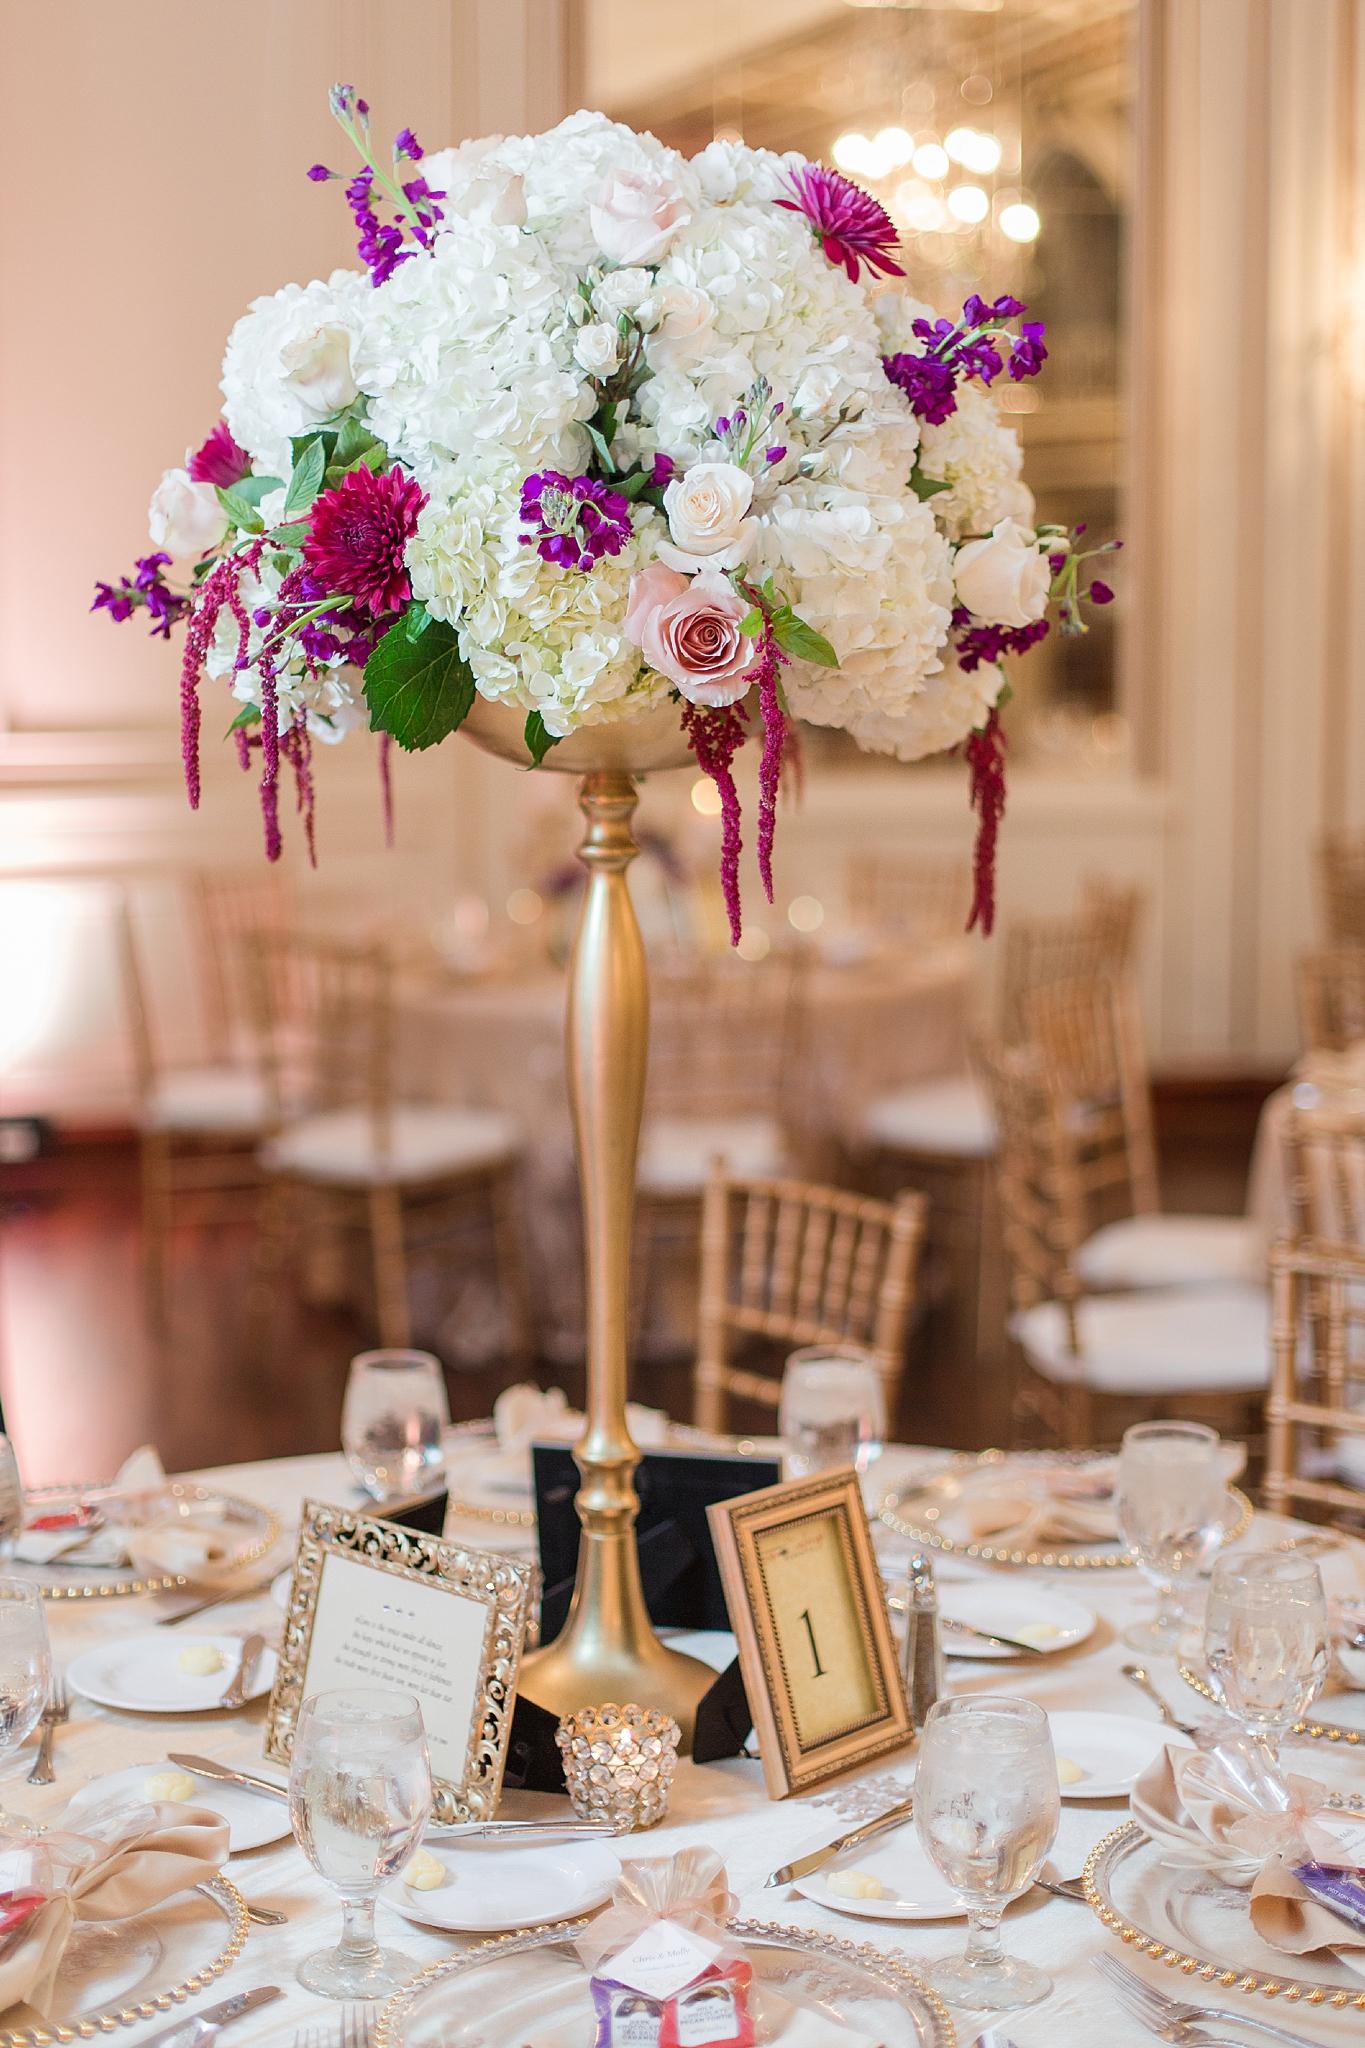 detroit-colony-club-wedding-regal-romantic-photography-in-detroit-mi-by-courtney-carolyn-photography_0034.jpg